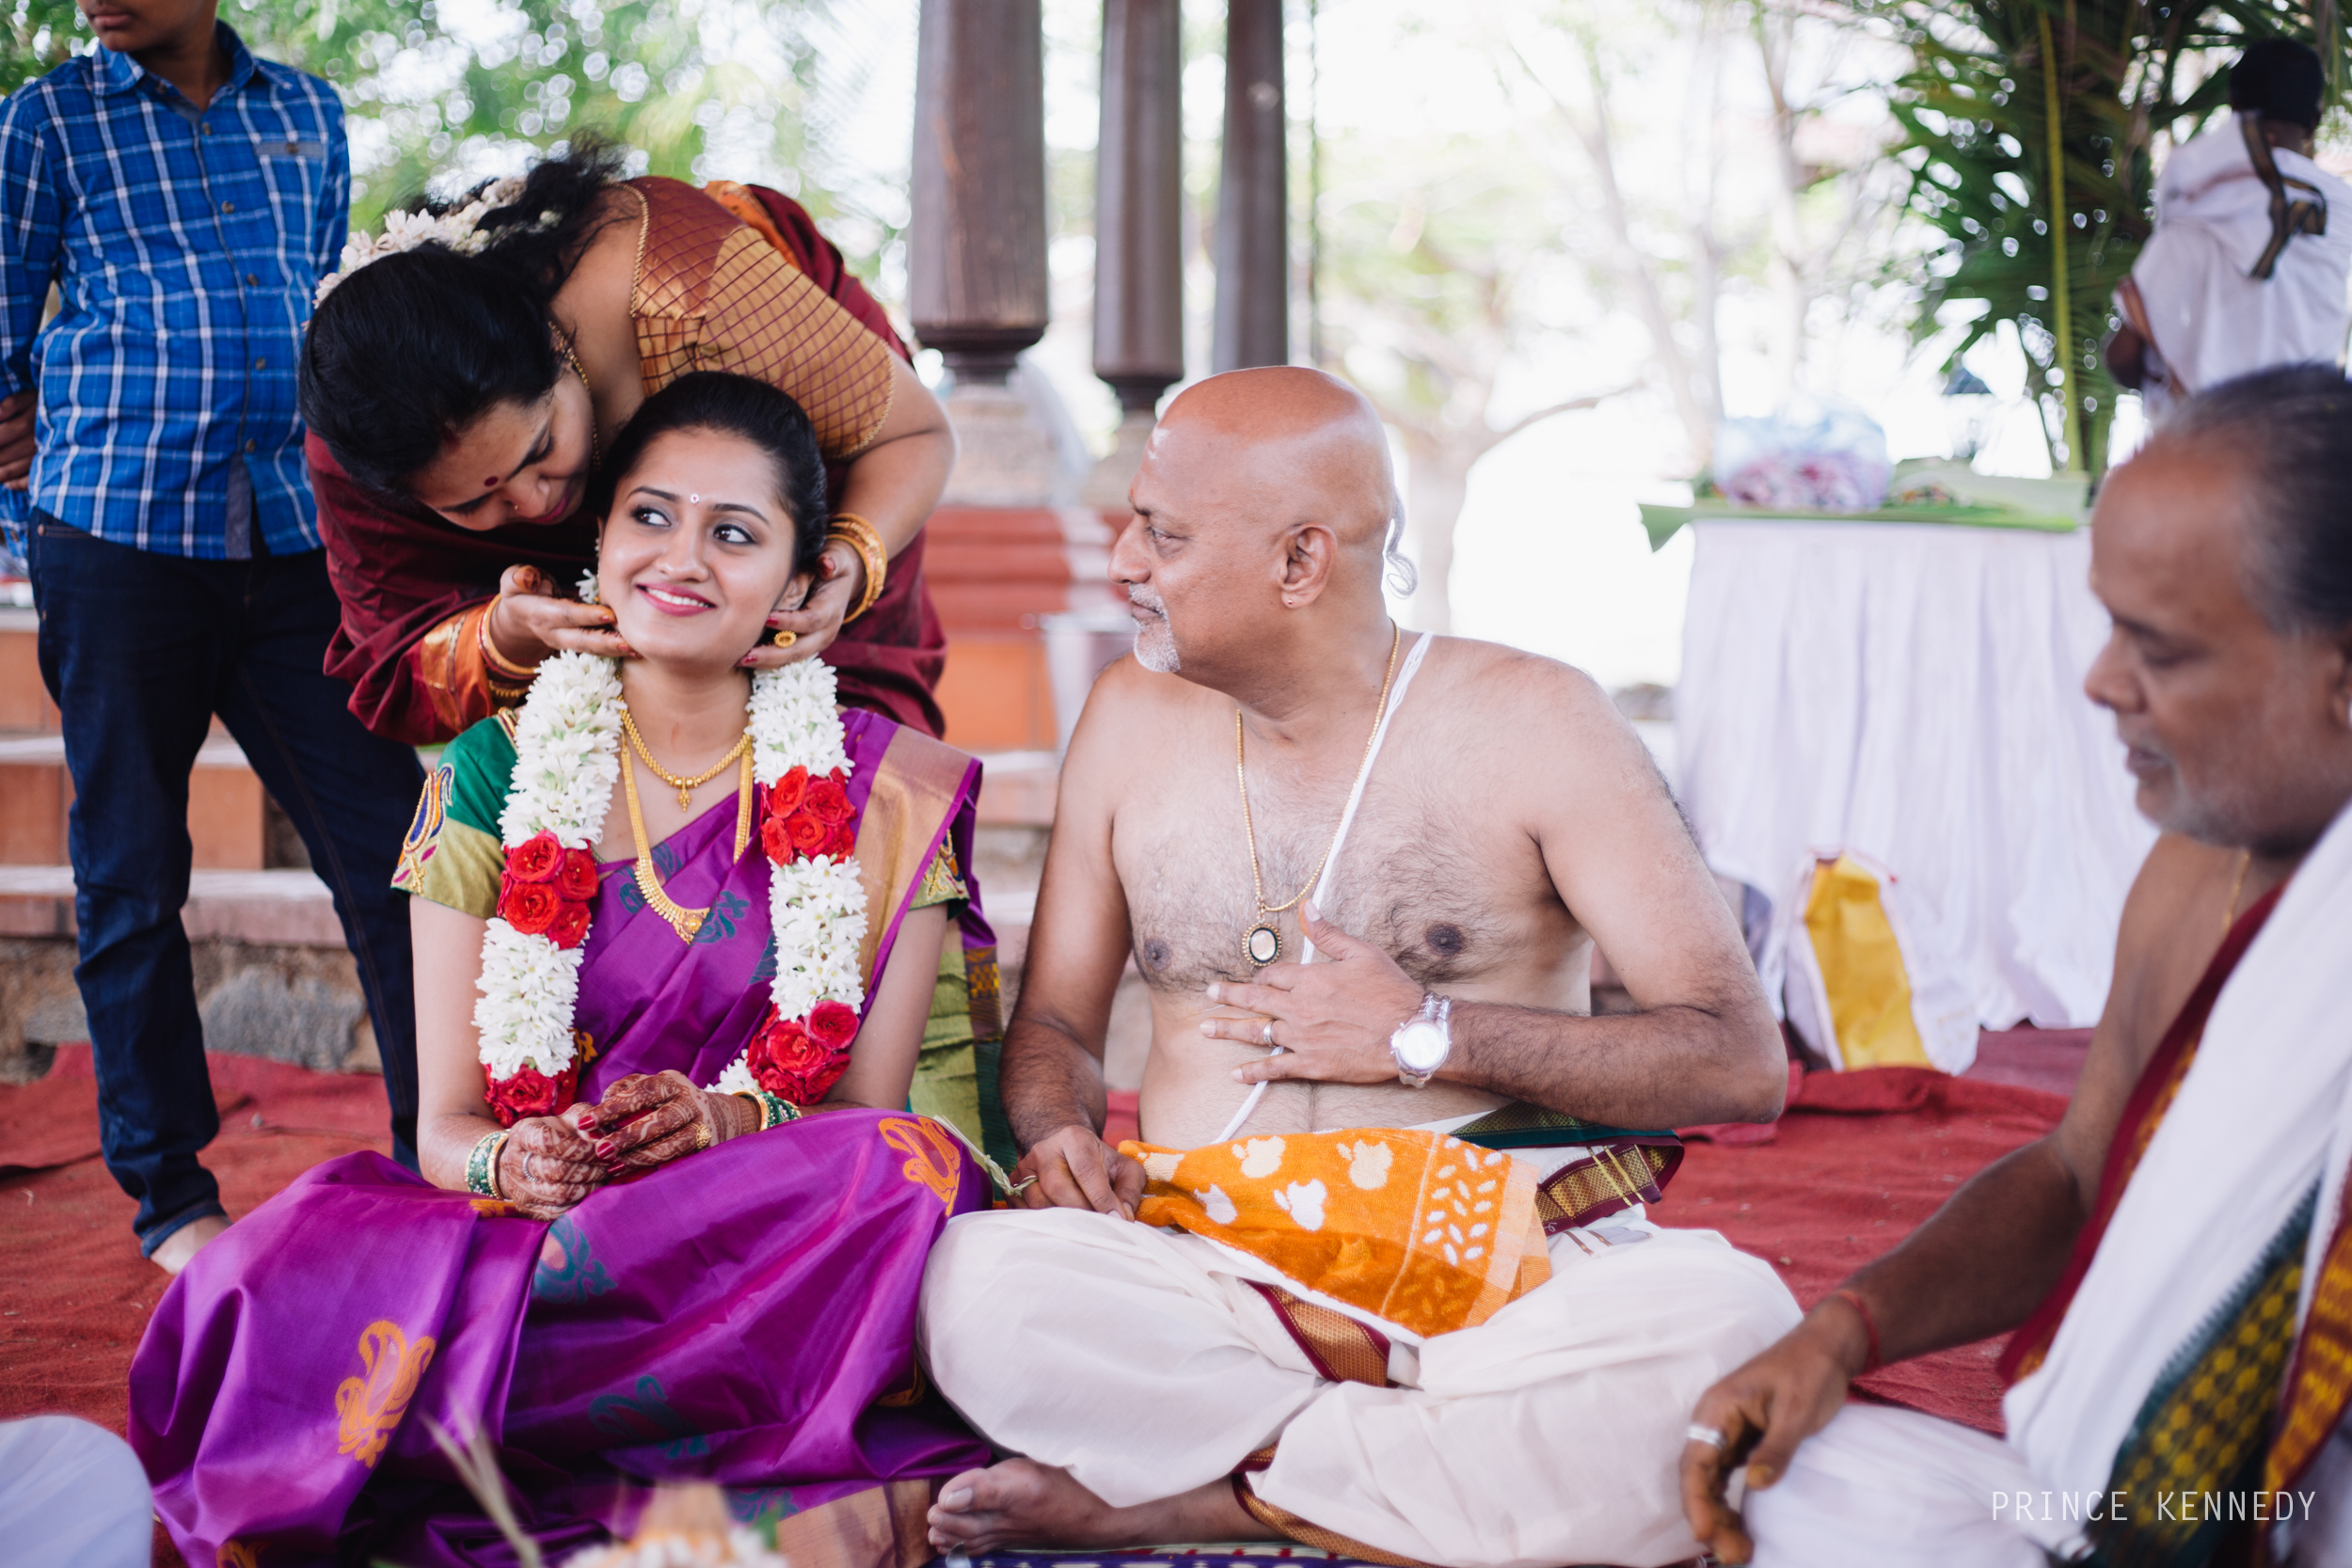 Athmajja-Nithesh-Engagement-Couple-Portrait-Portraiture-Wedding-Couple-Portrait-Chennai-Photographer-Candid-Photography-Destination-Best-Prince-Kennedy-Photography-23.jpg